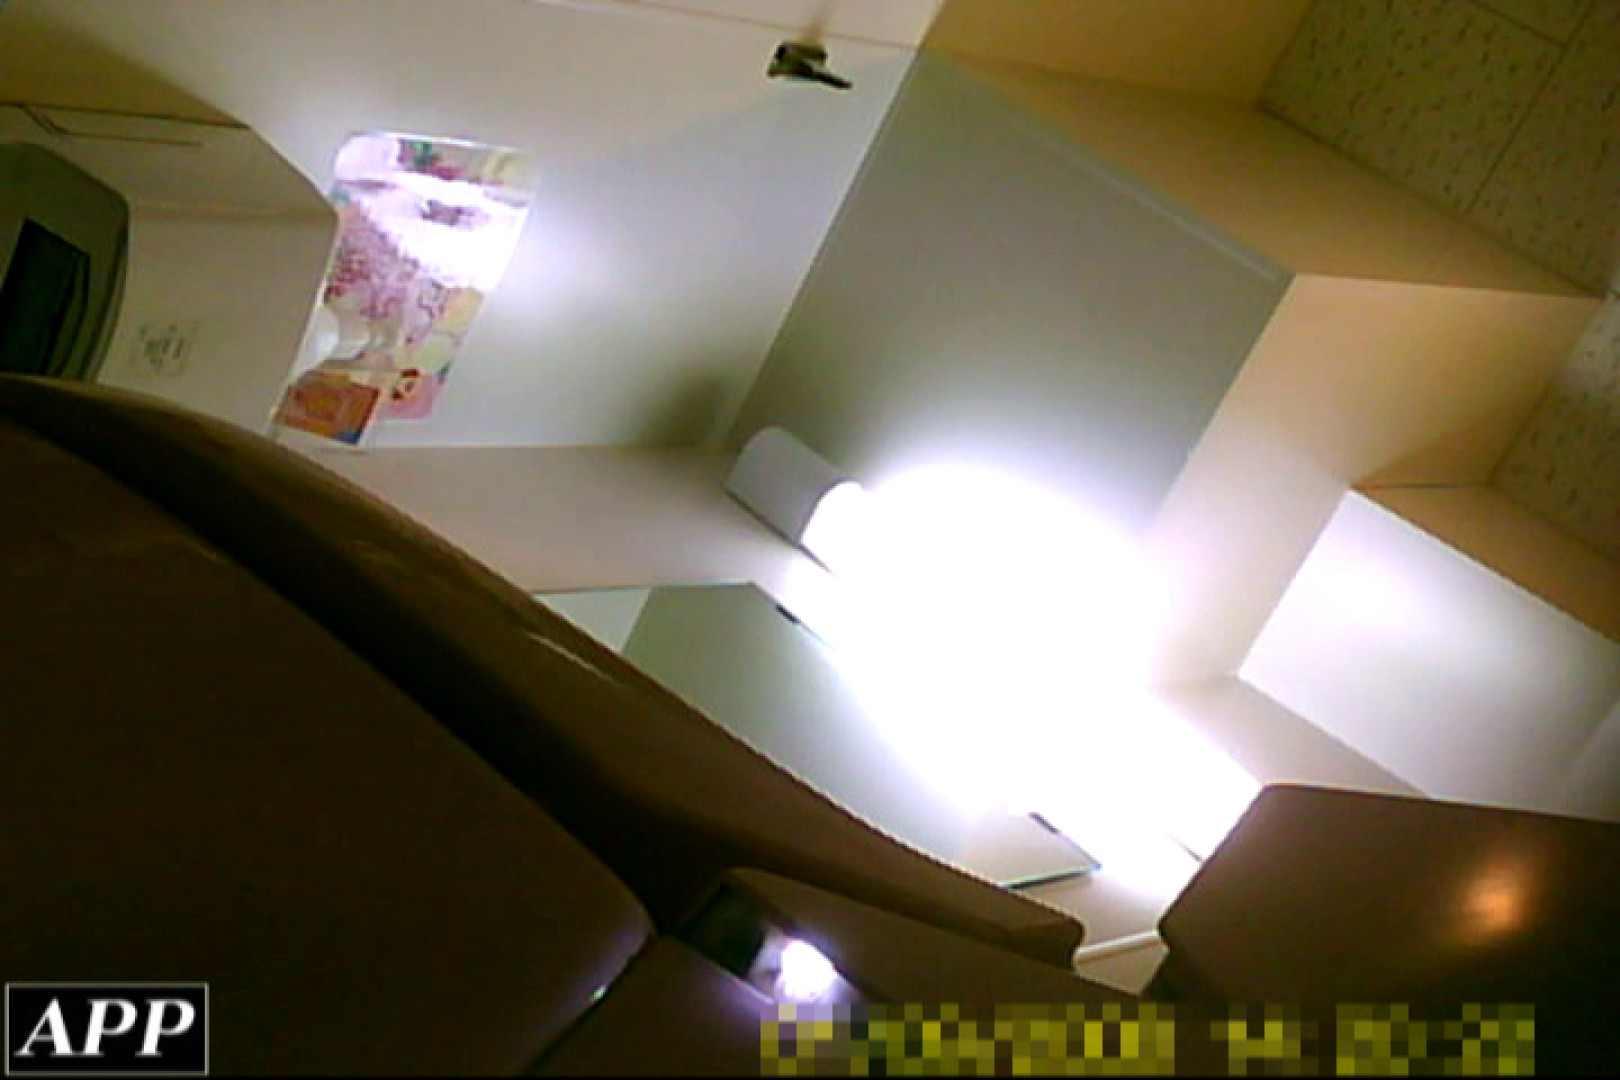 3視点洗面所 vol.095 OLセックス | 洗面所  87画像 61